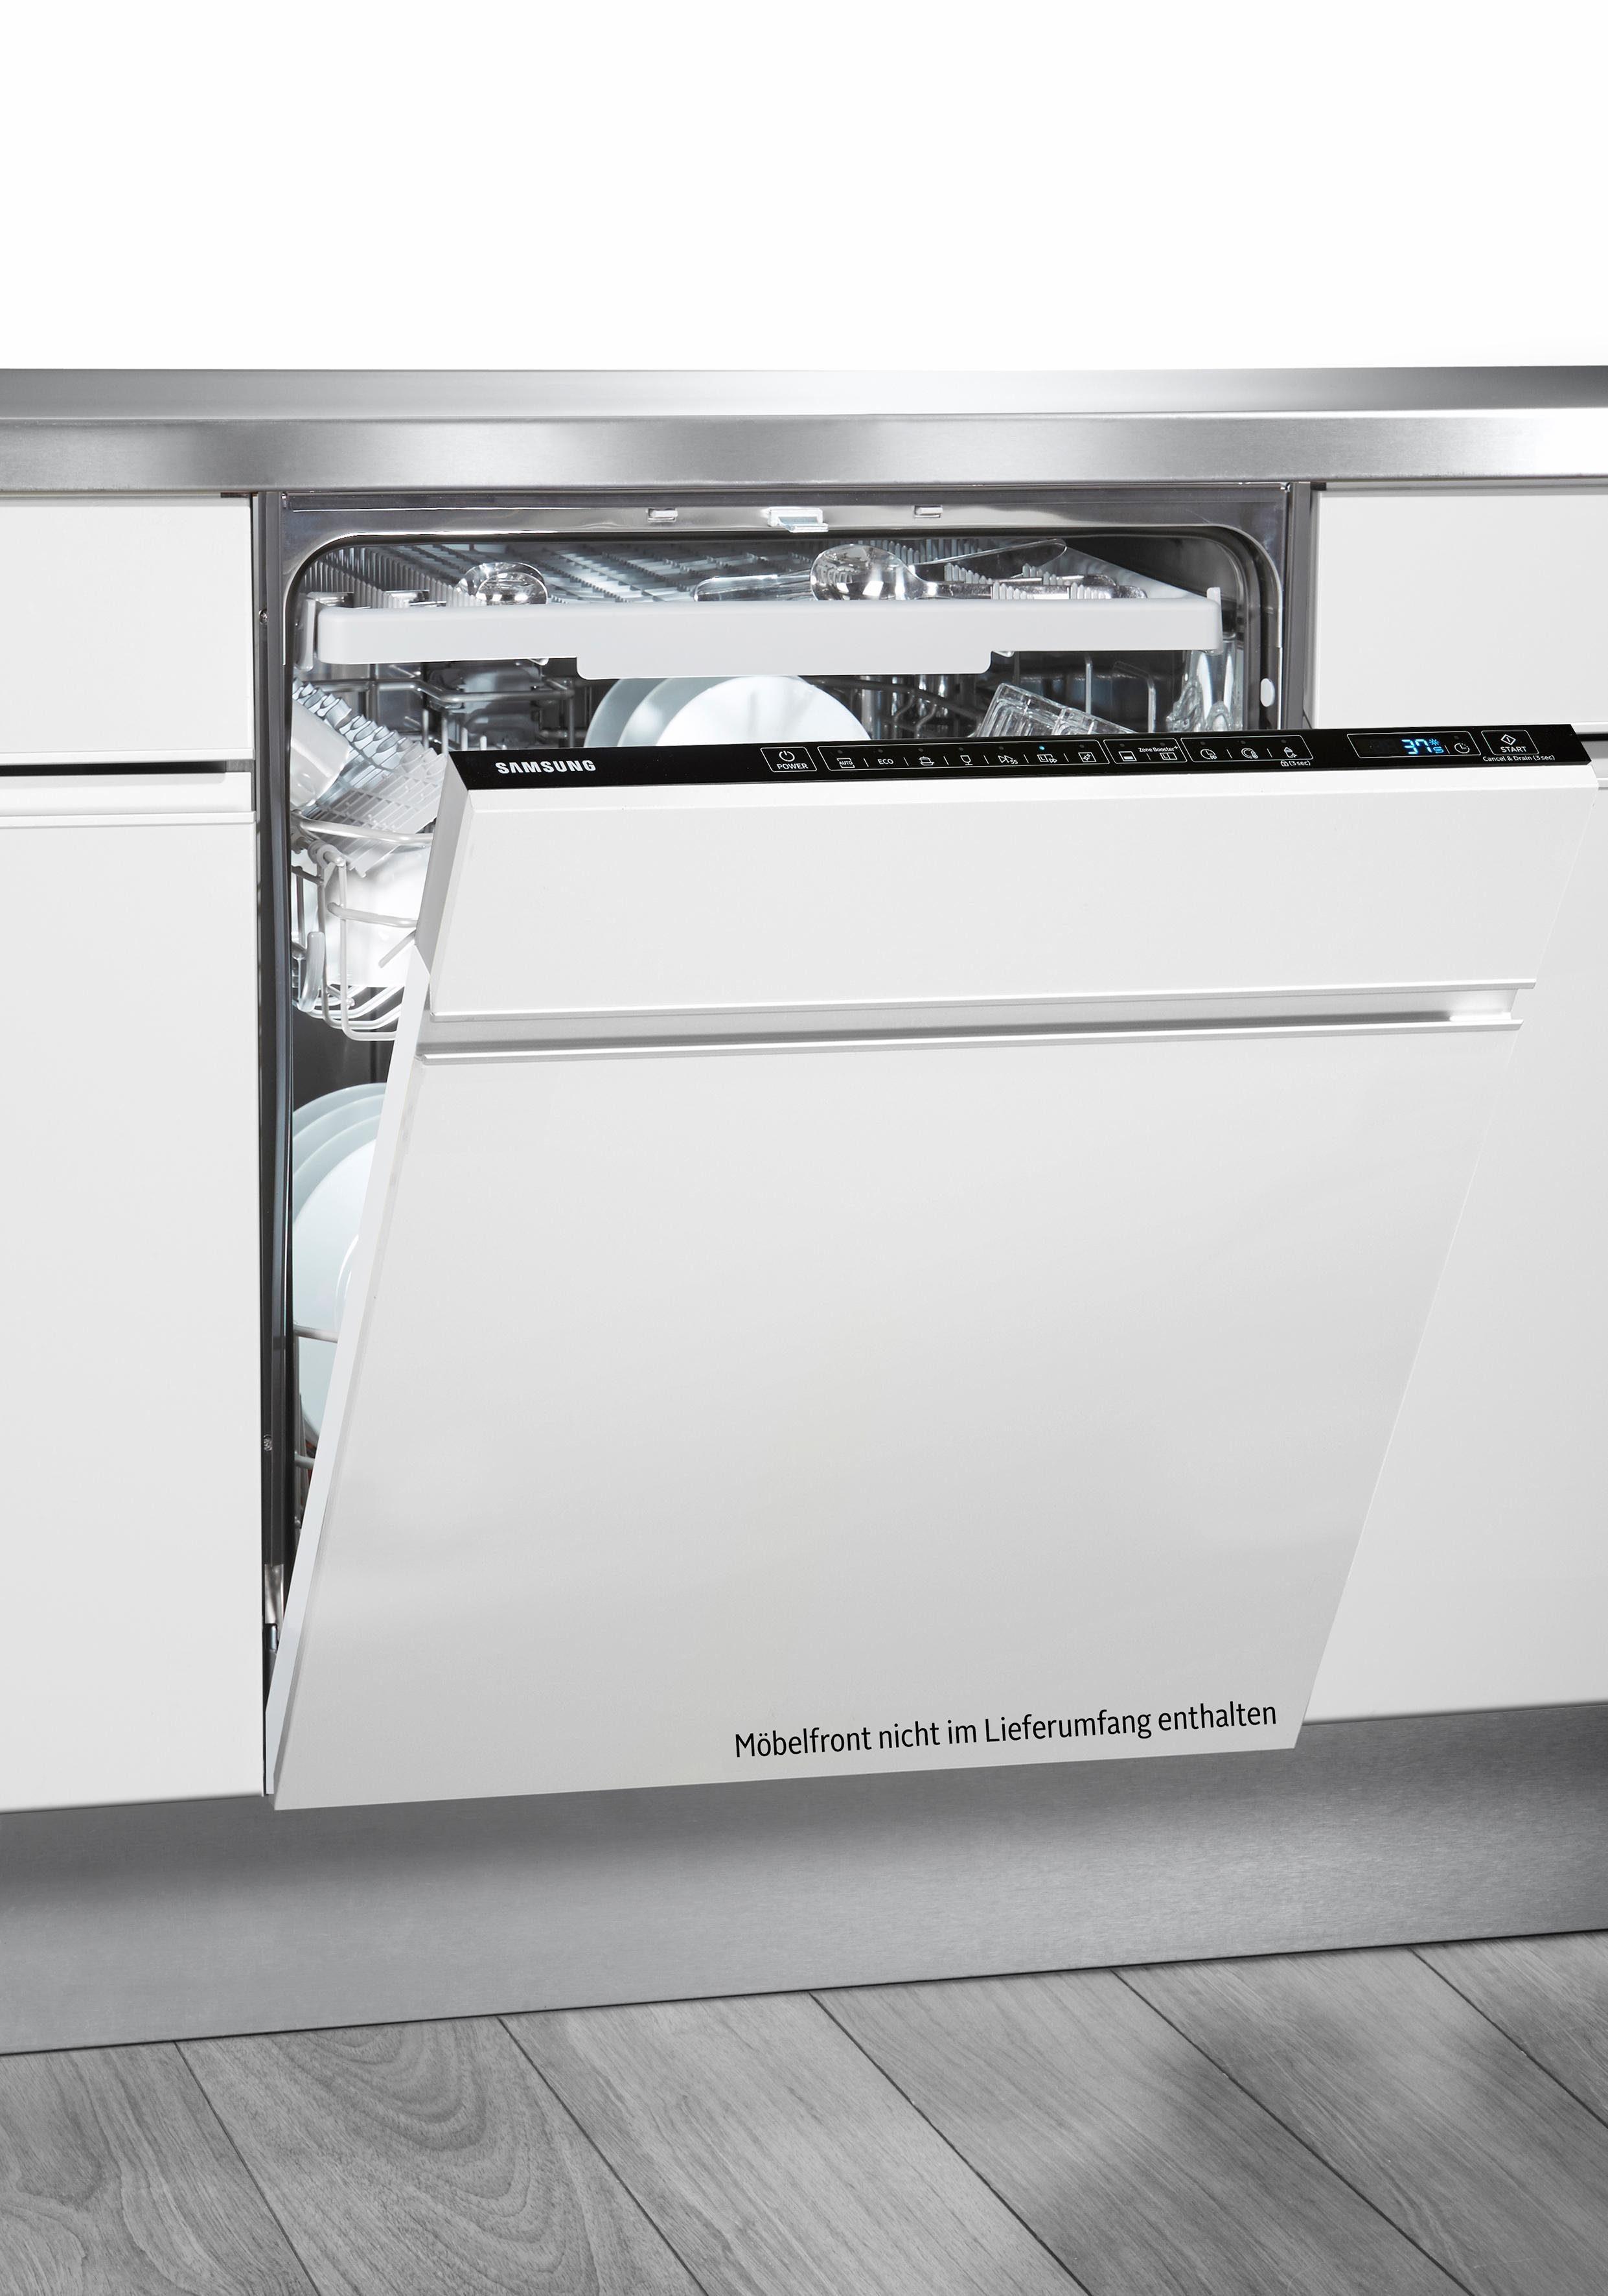 Samsung vollintegrierbarer Geschirrspüler, DW60M9550BB/EG, 9,7 l, 14 Maßgedecke